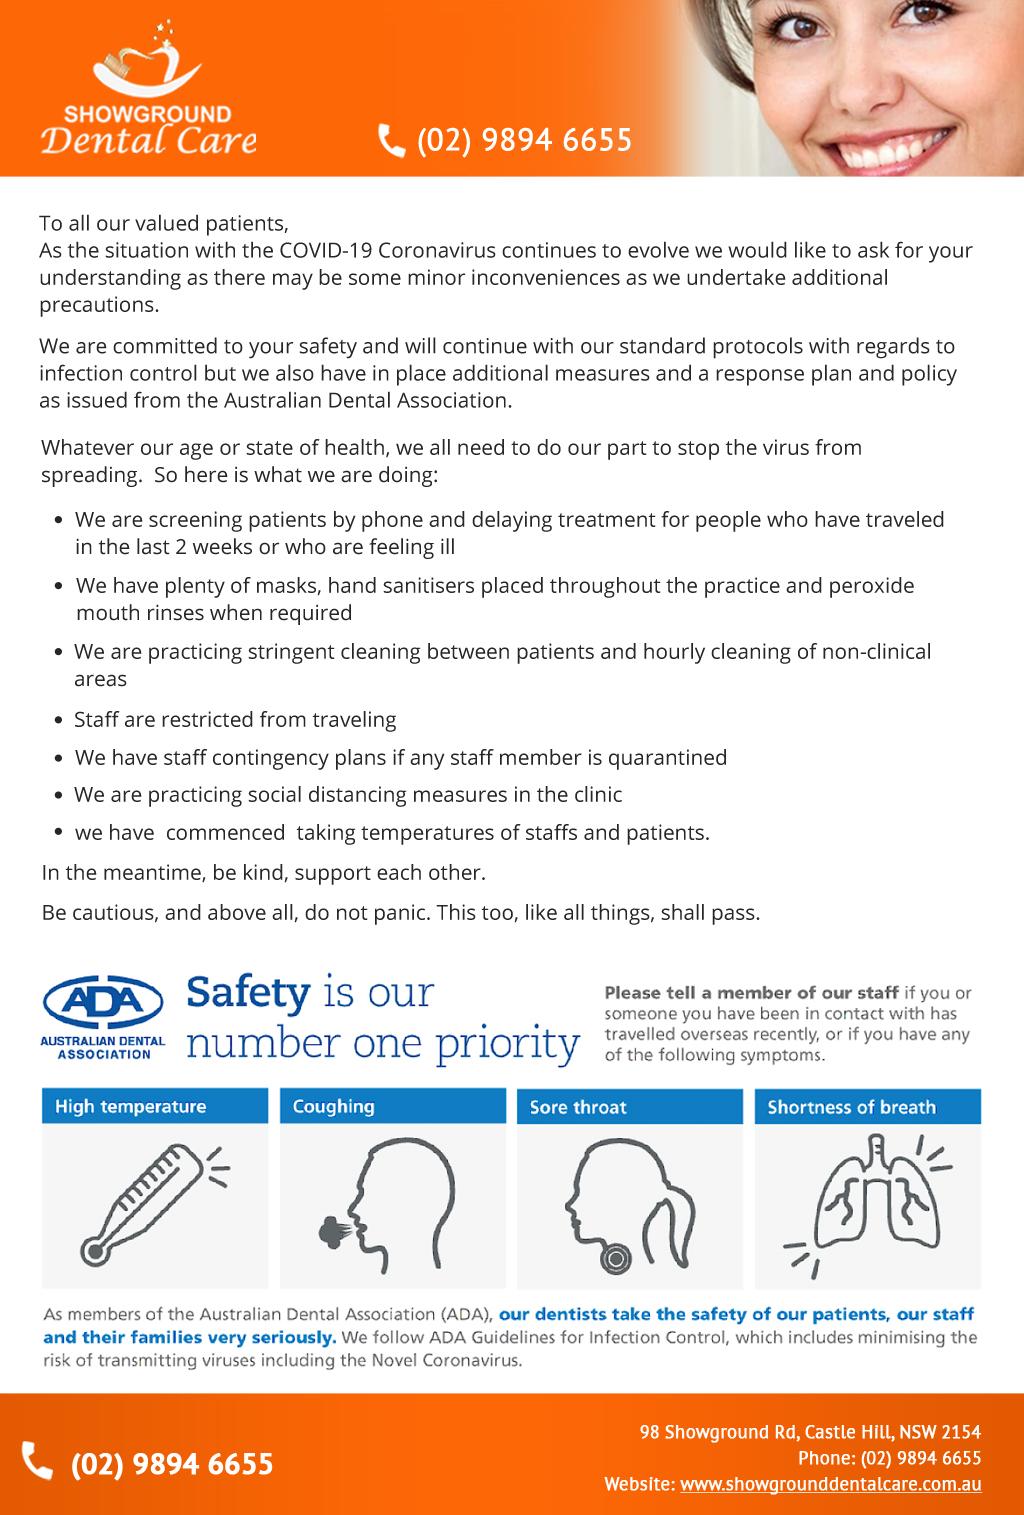 covid-safety dental